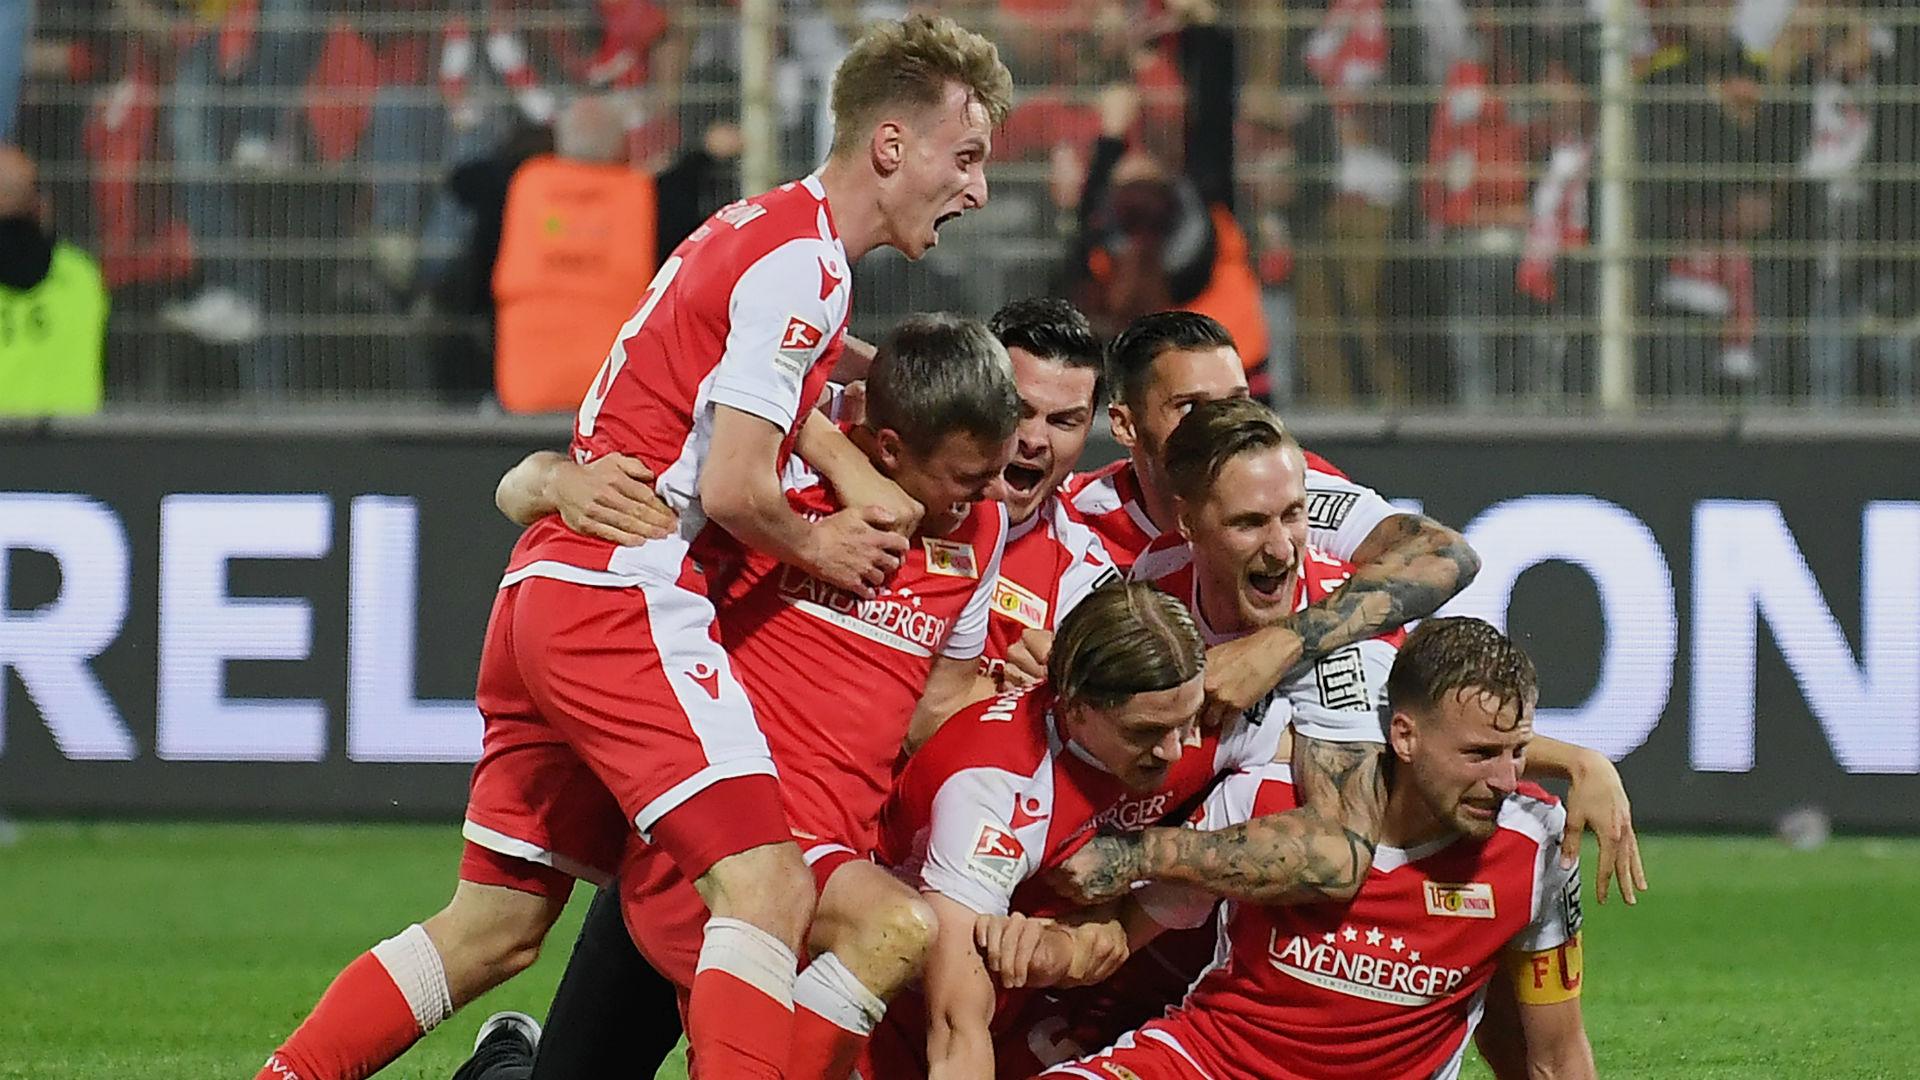 Union Berlin go play for Bundesliga next season